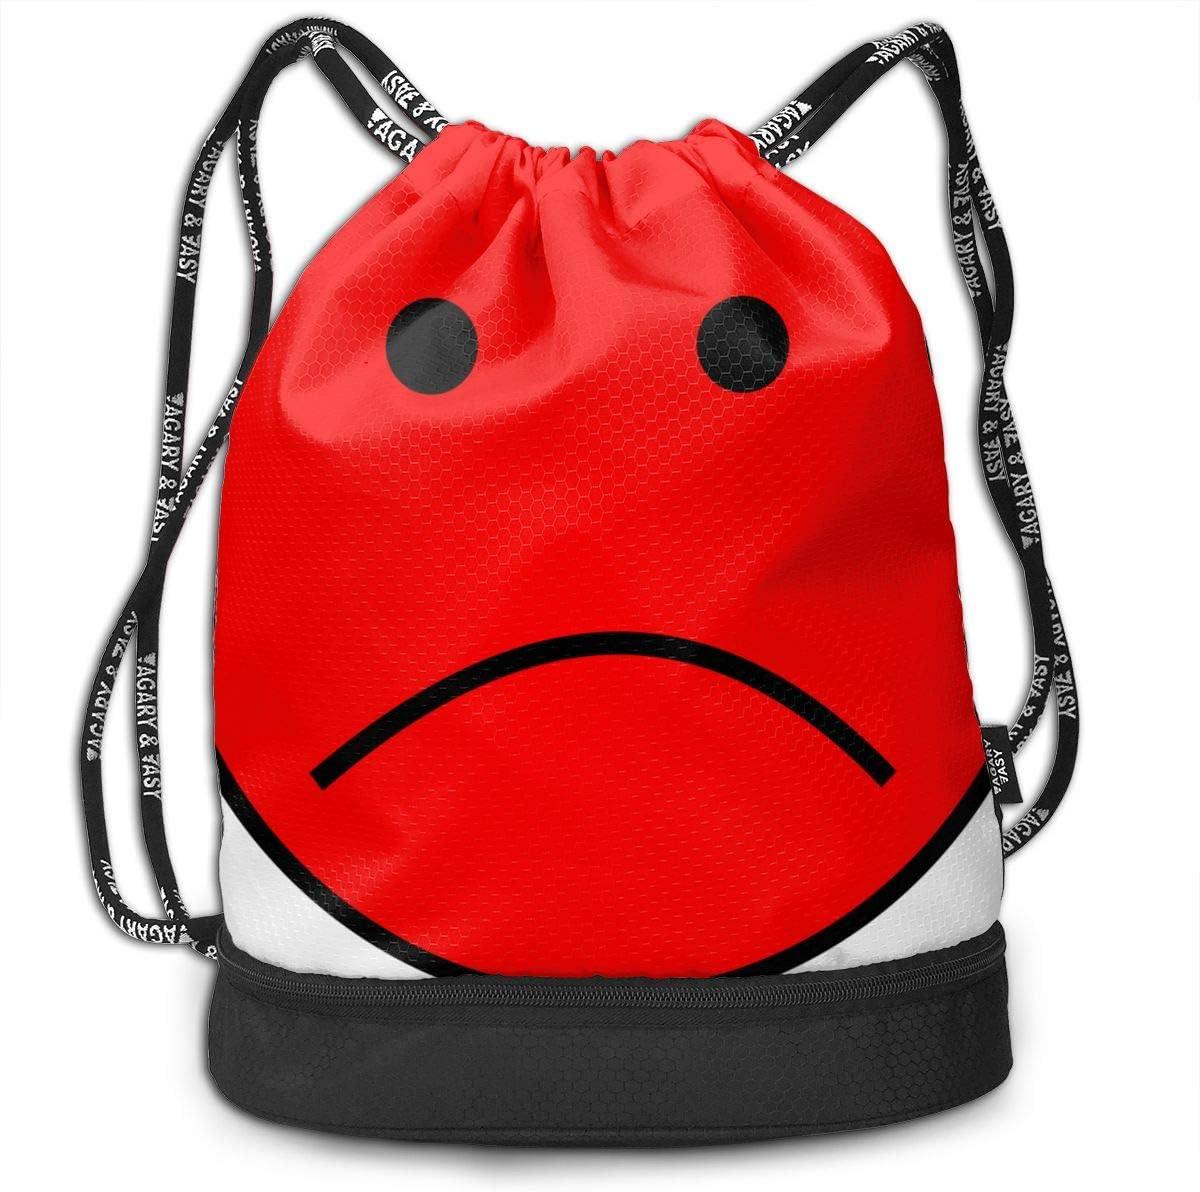 Red Sadness Wrong Expression Drawstring Bag Multipurpose Bundle Dance Bag Sack Pack